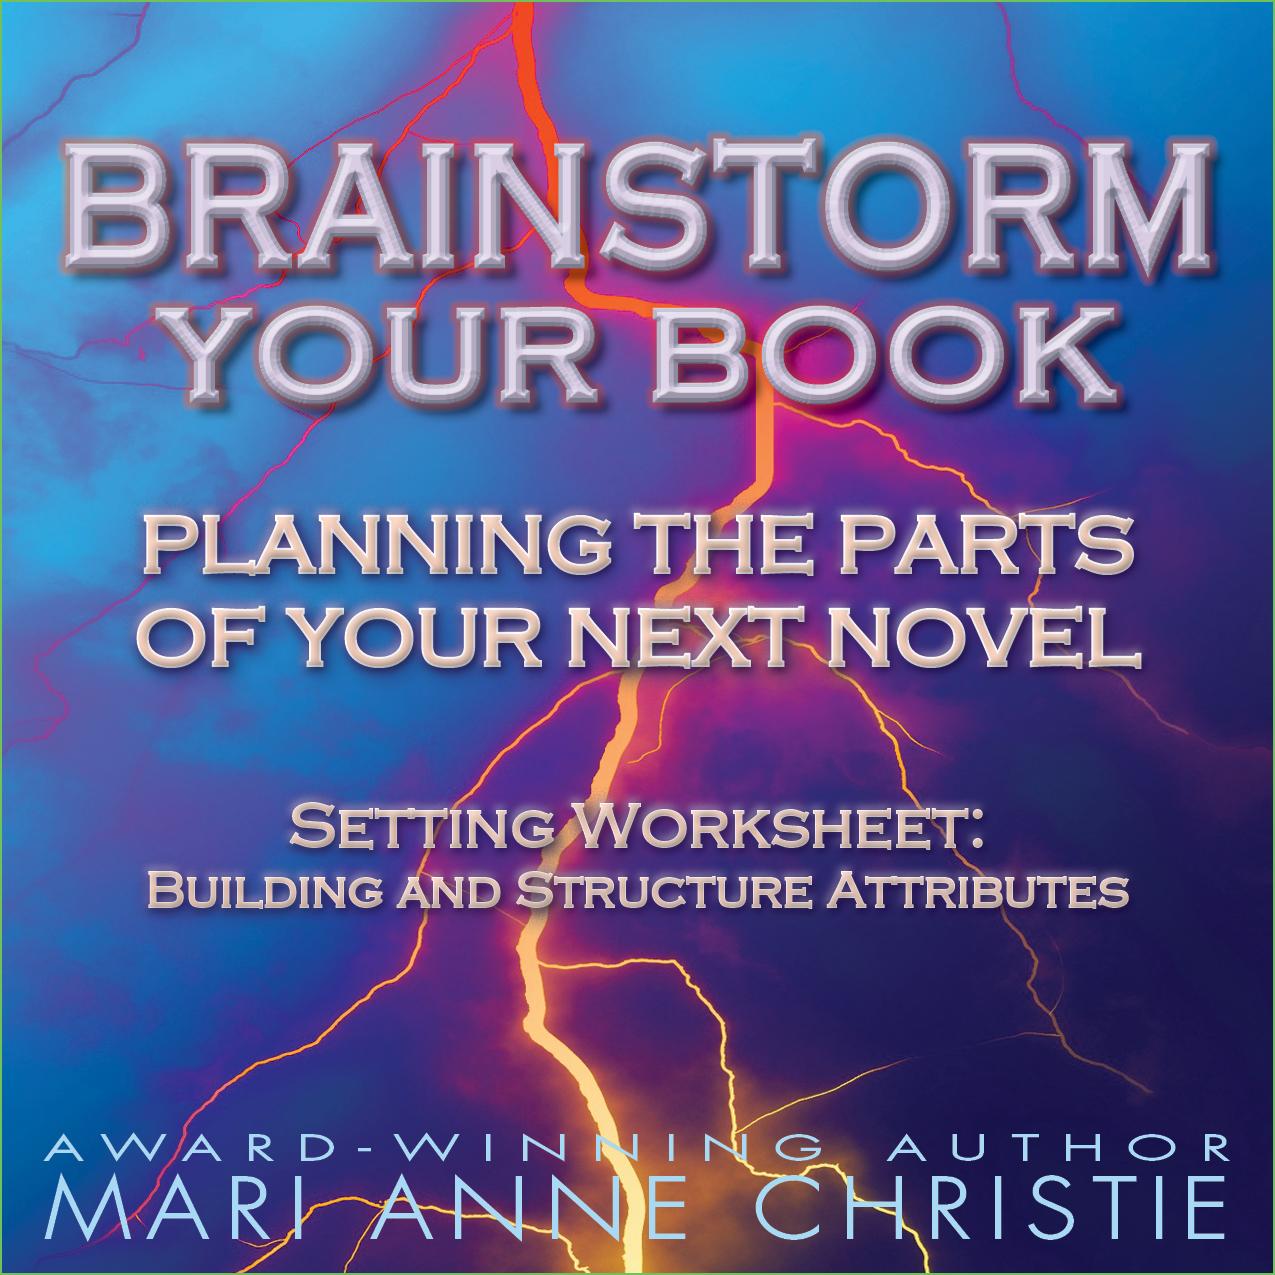 Brainstorm Your Book Mari Anne Christie